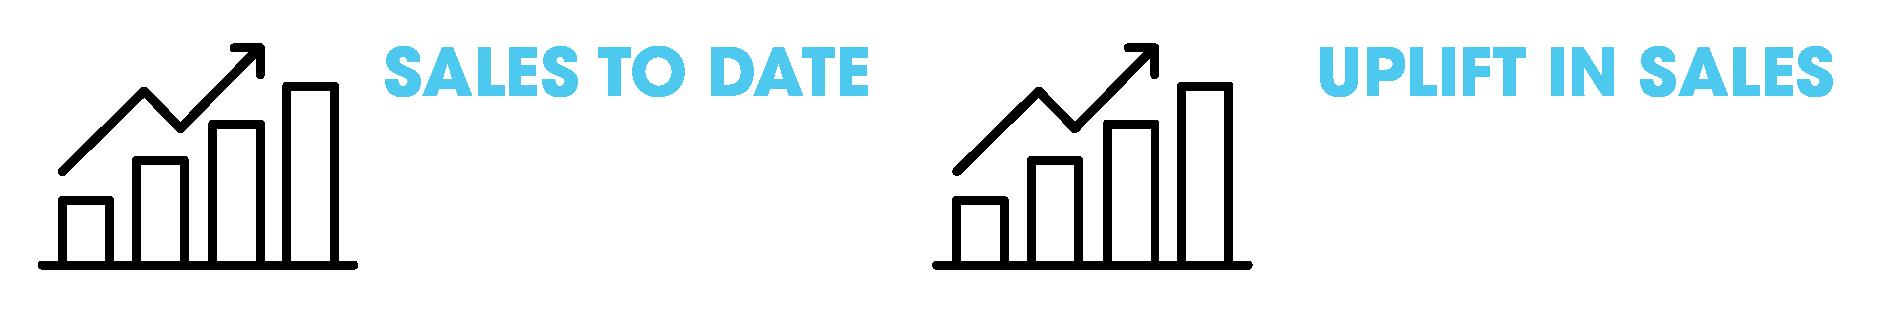 Stats-Lavazza-24.png